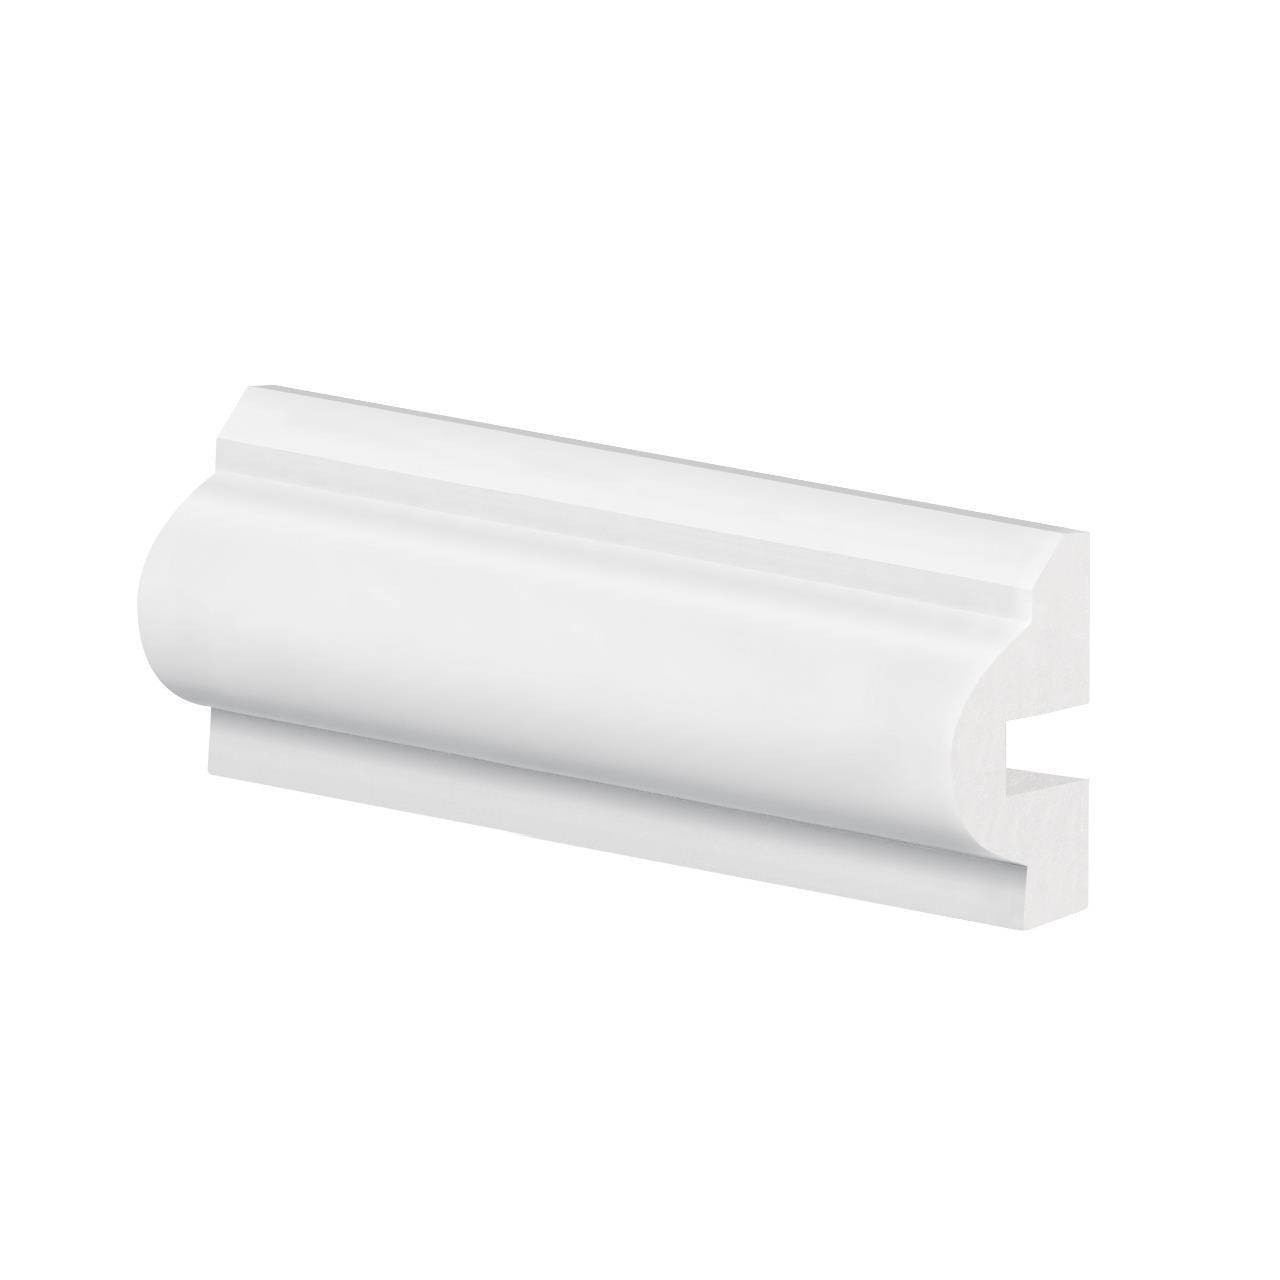 Rodameio 3cm Branco Poliestireno 240m - 018343103 - Arquitech